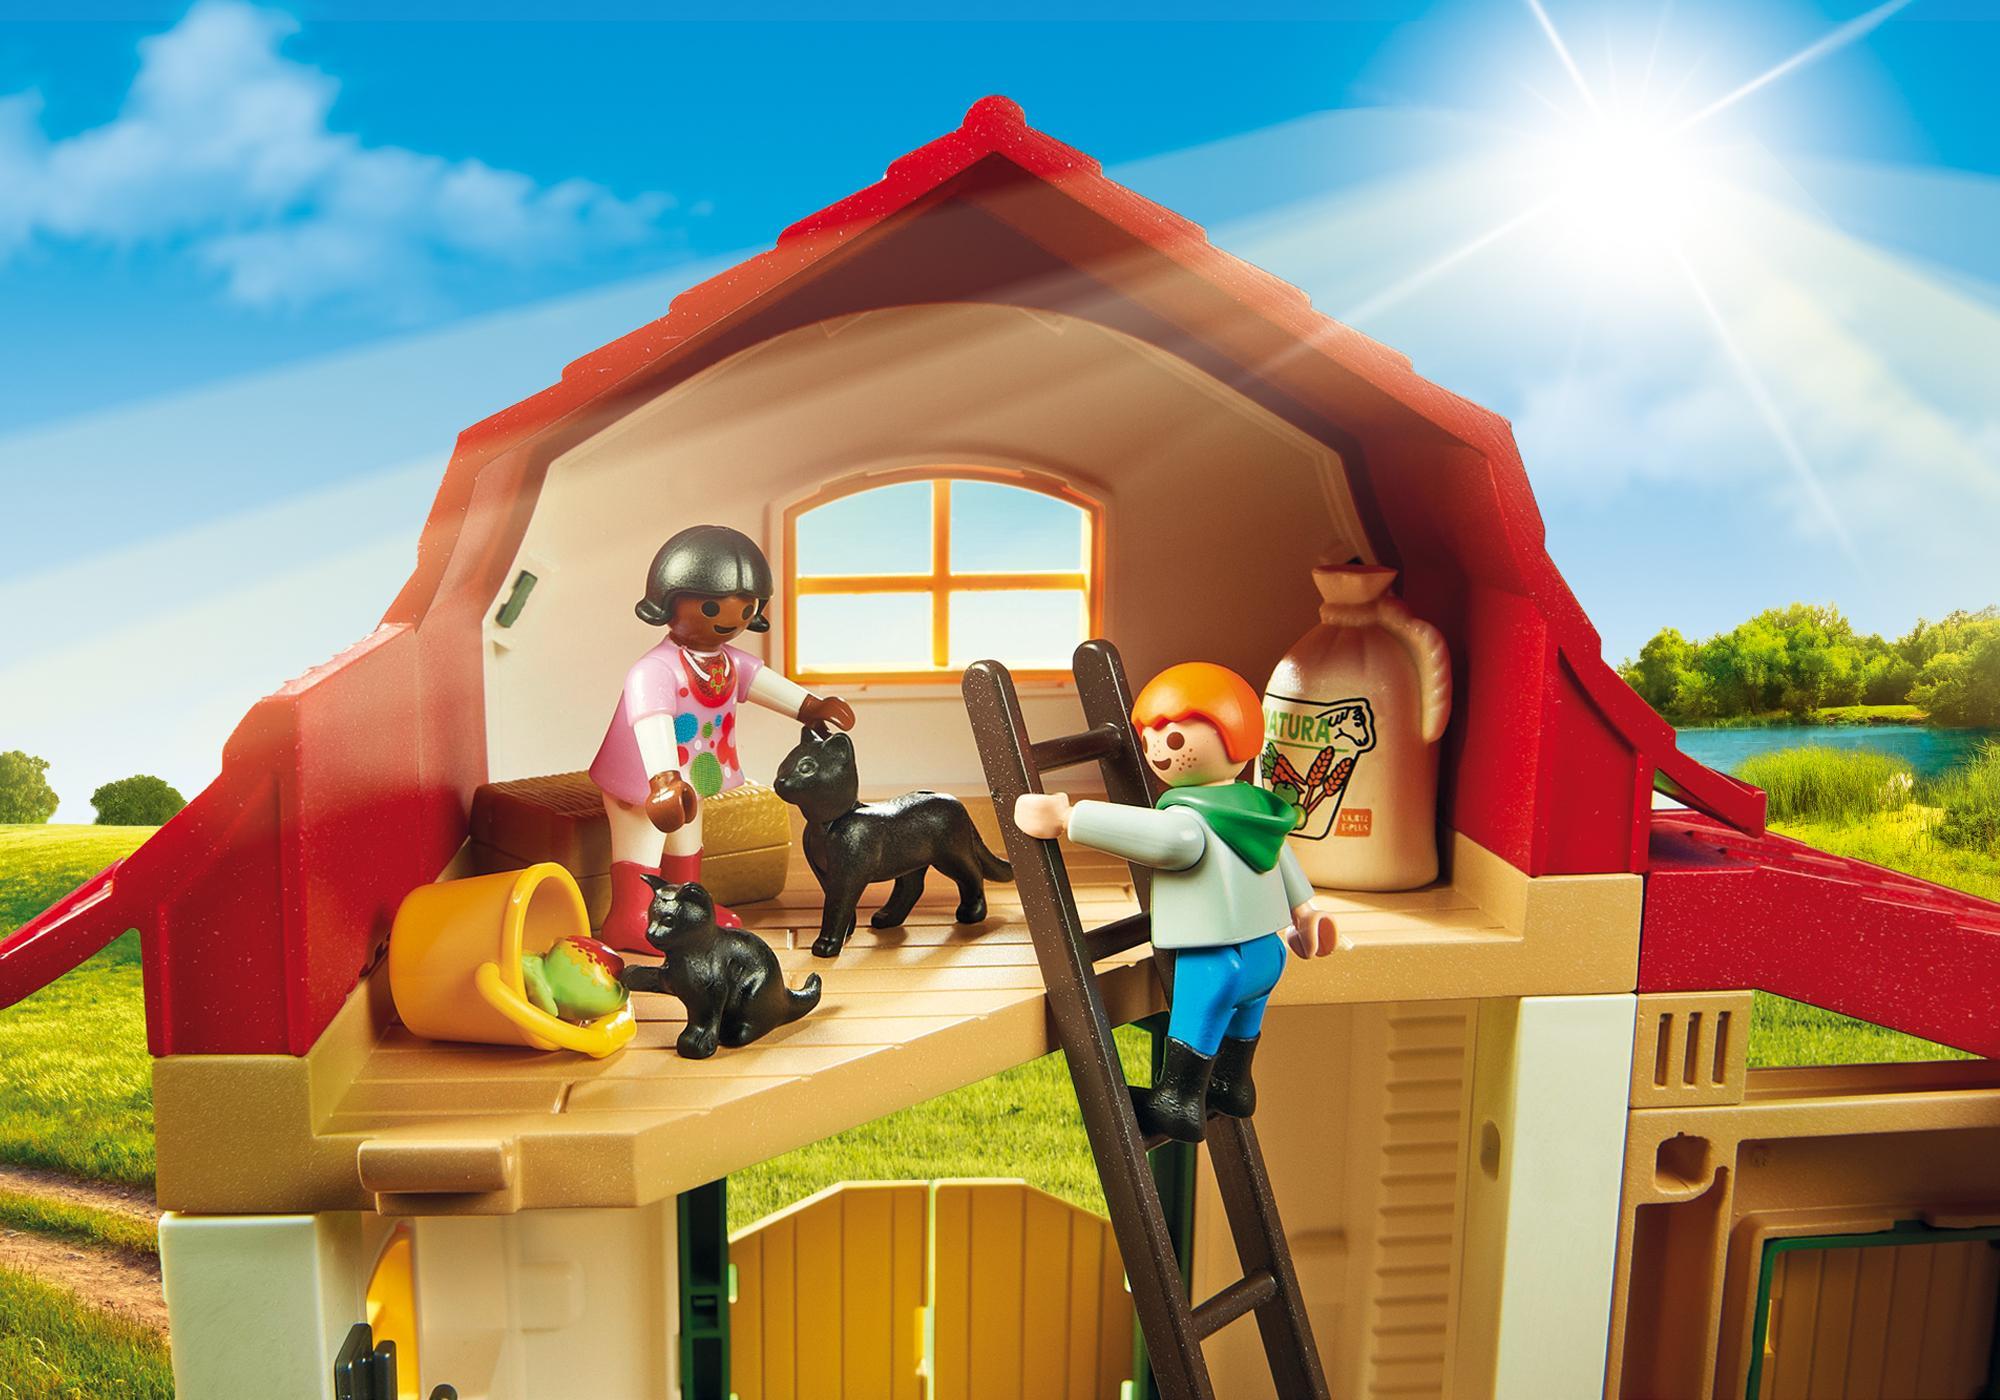 http://media.playmobil.com/i/playmobil/6927_product_extra1